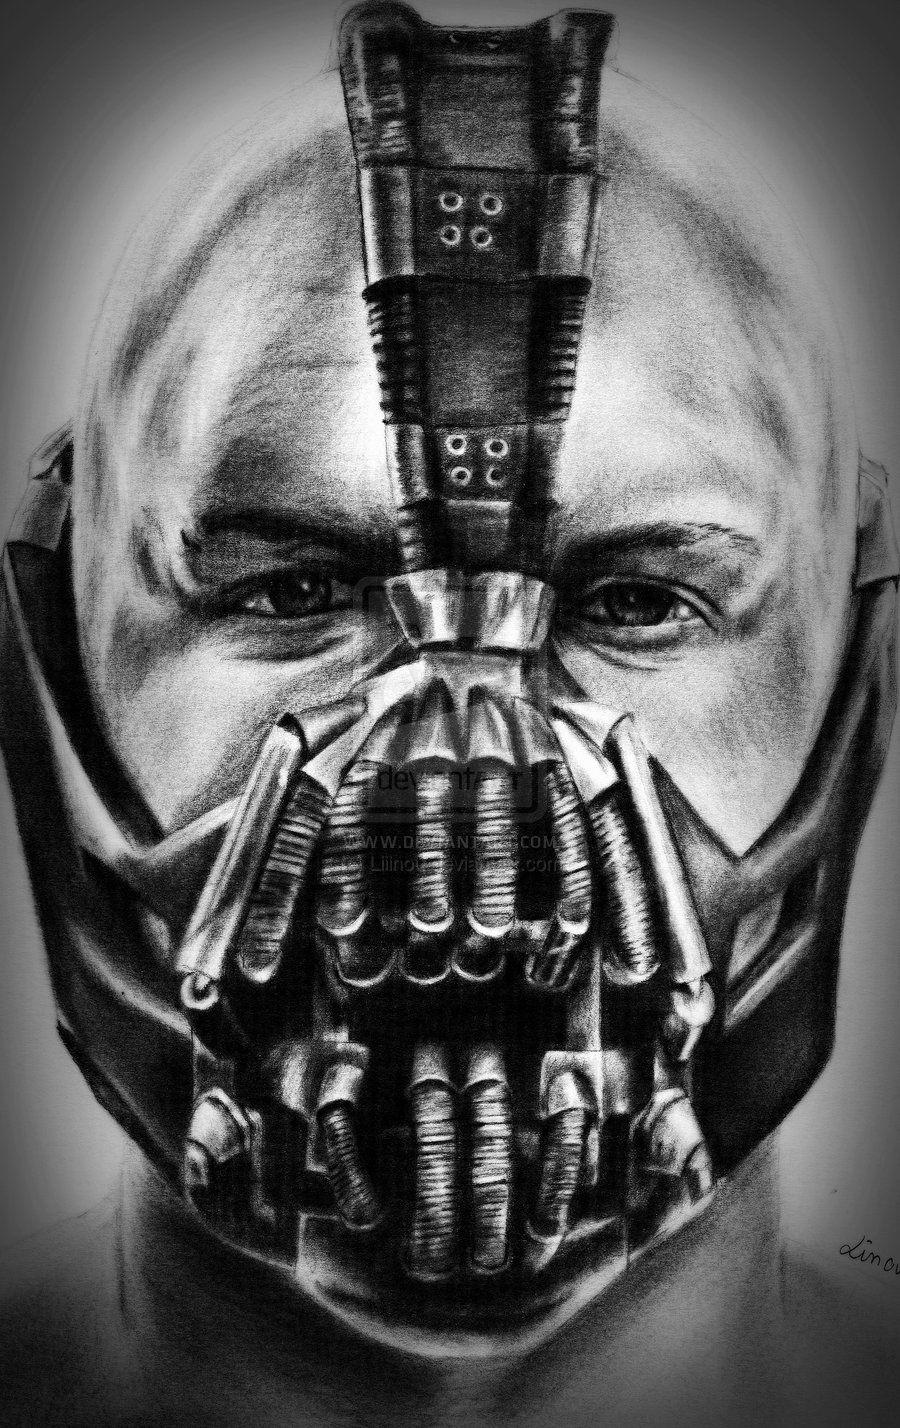 Bane By Liiinou On Deviantart Bane Batman Bane Mask Batman Tattoo